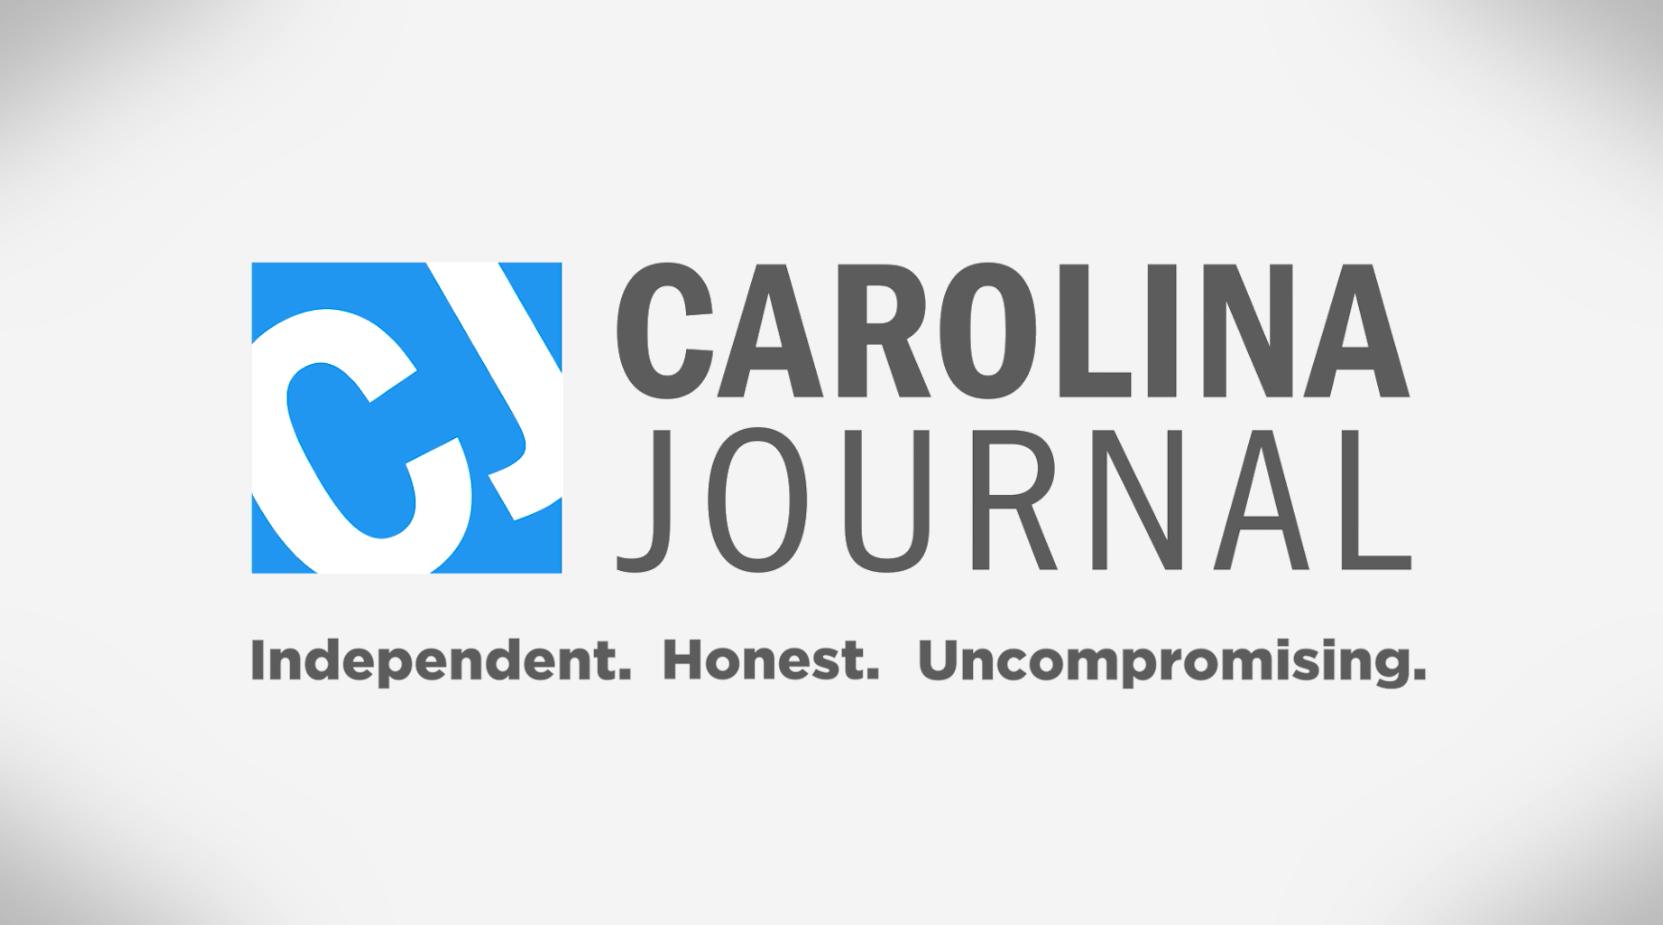 www.carolinajournal.com